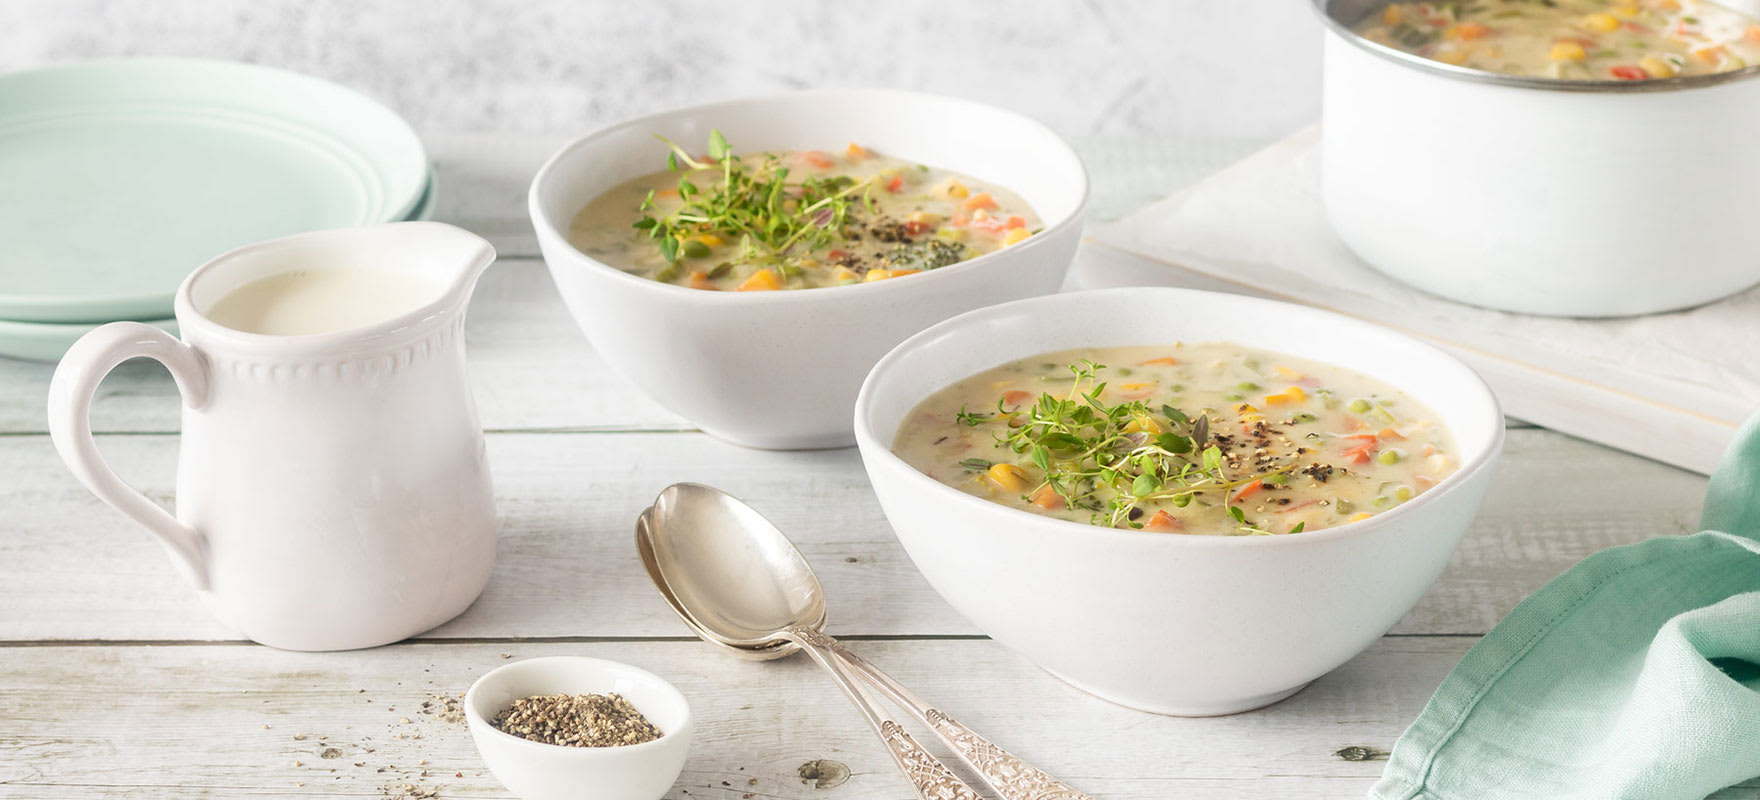 Creamy vegetable soup image 2